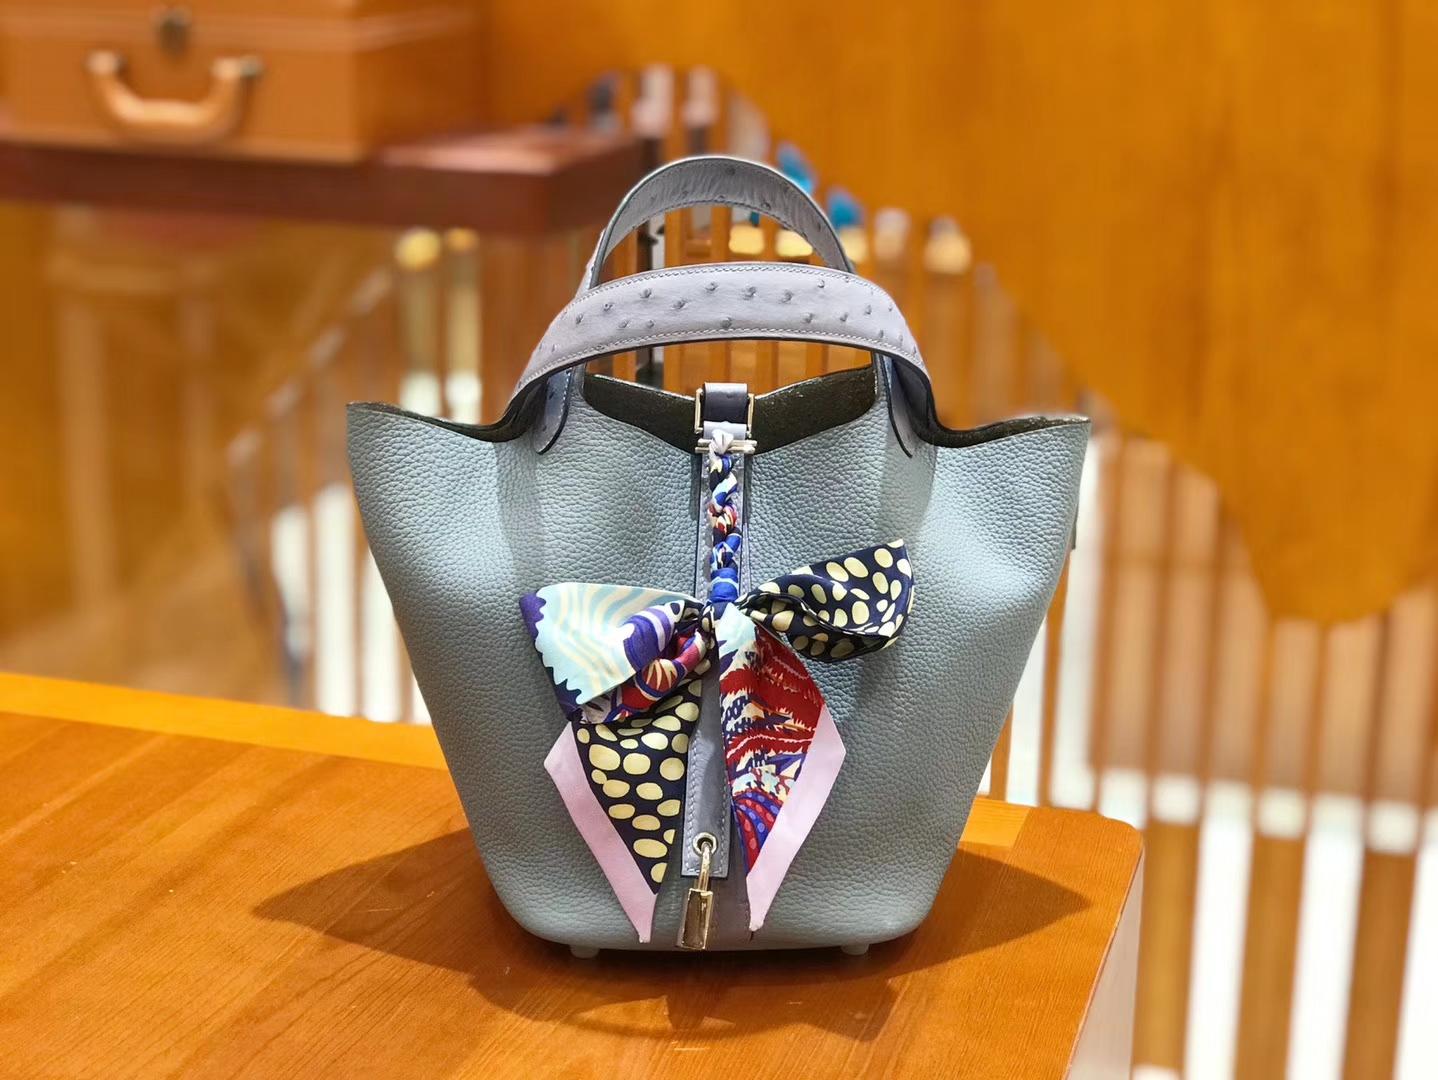 Hermès(爱马仕)Piction 18cm 鸵鸟拼牛皮 冰川蓝 全手工缝制